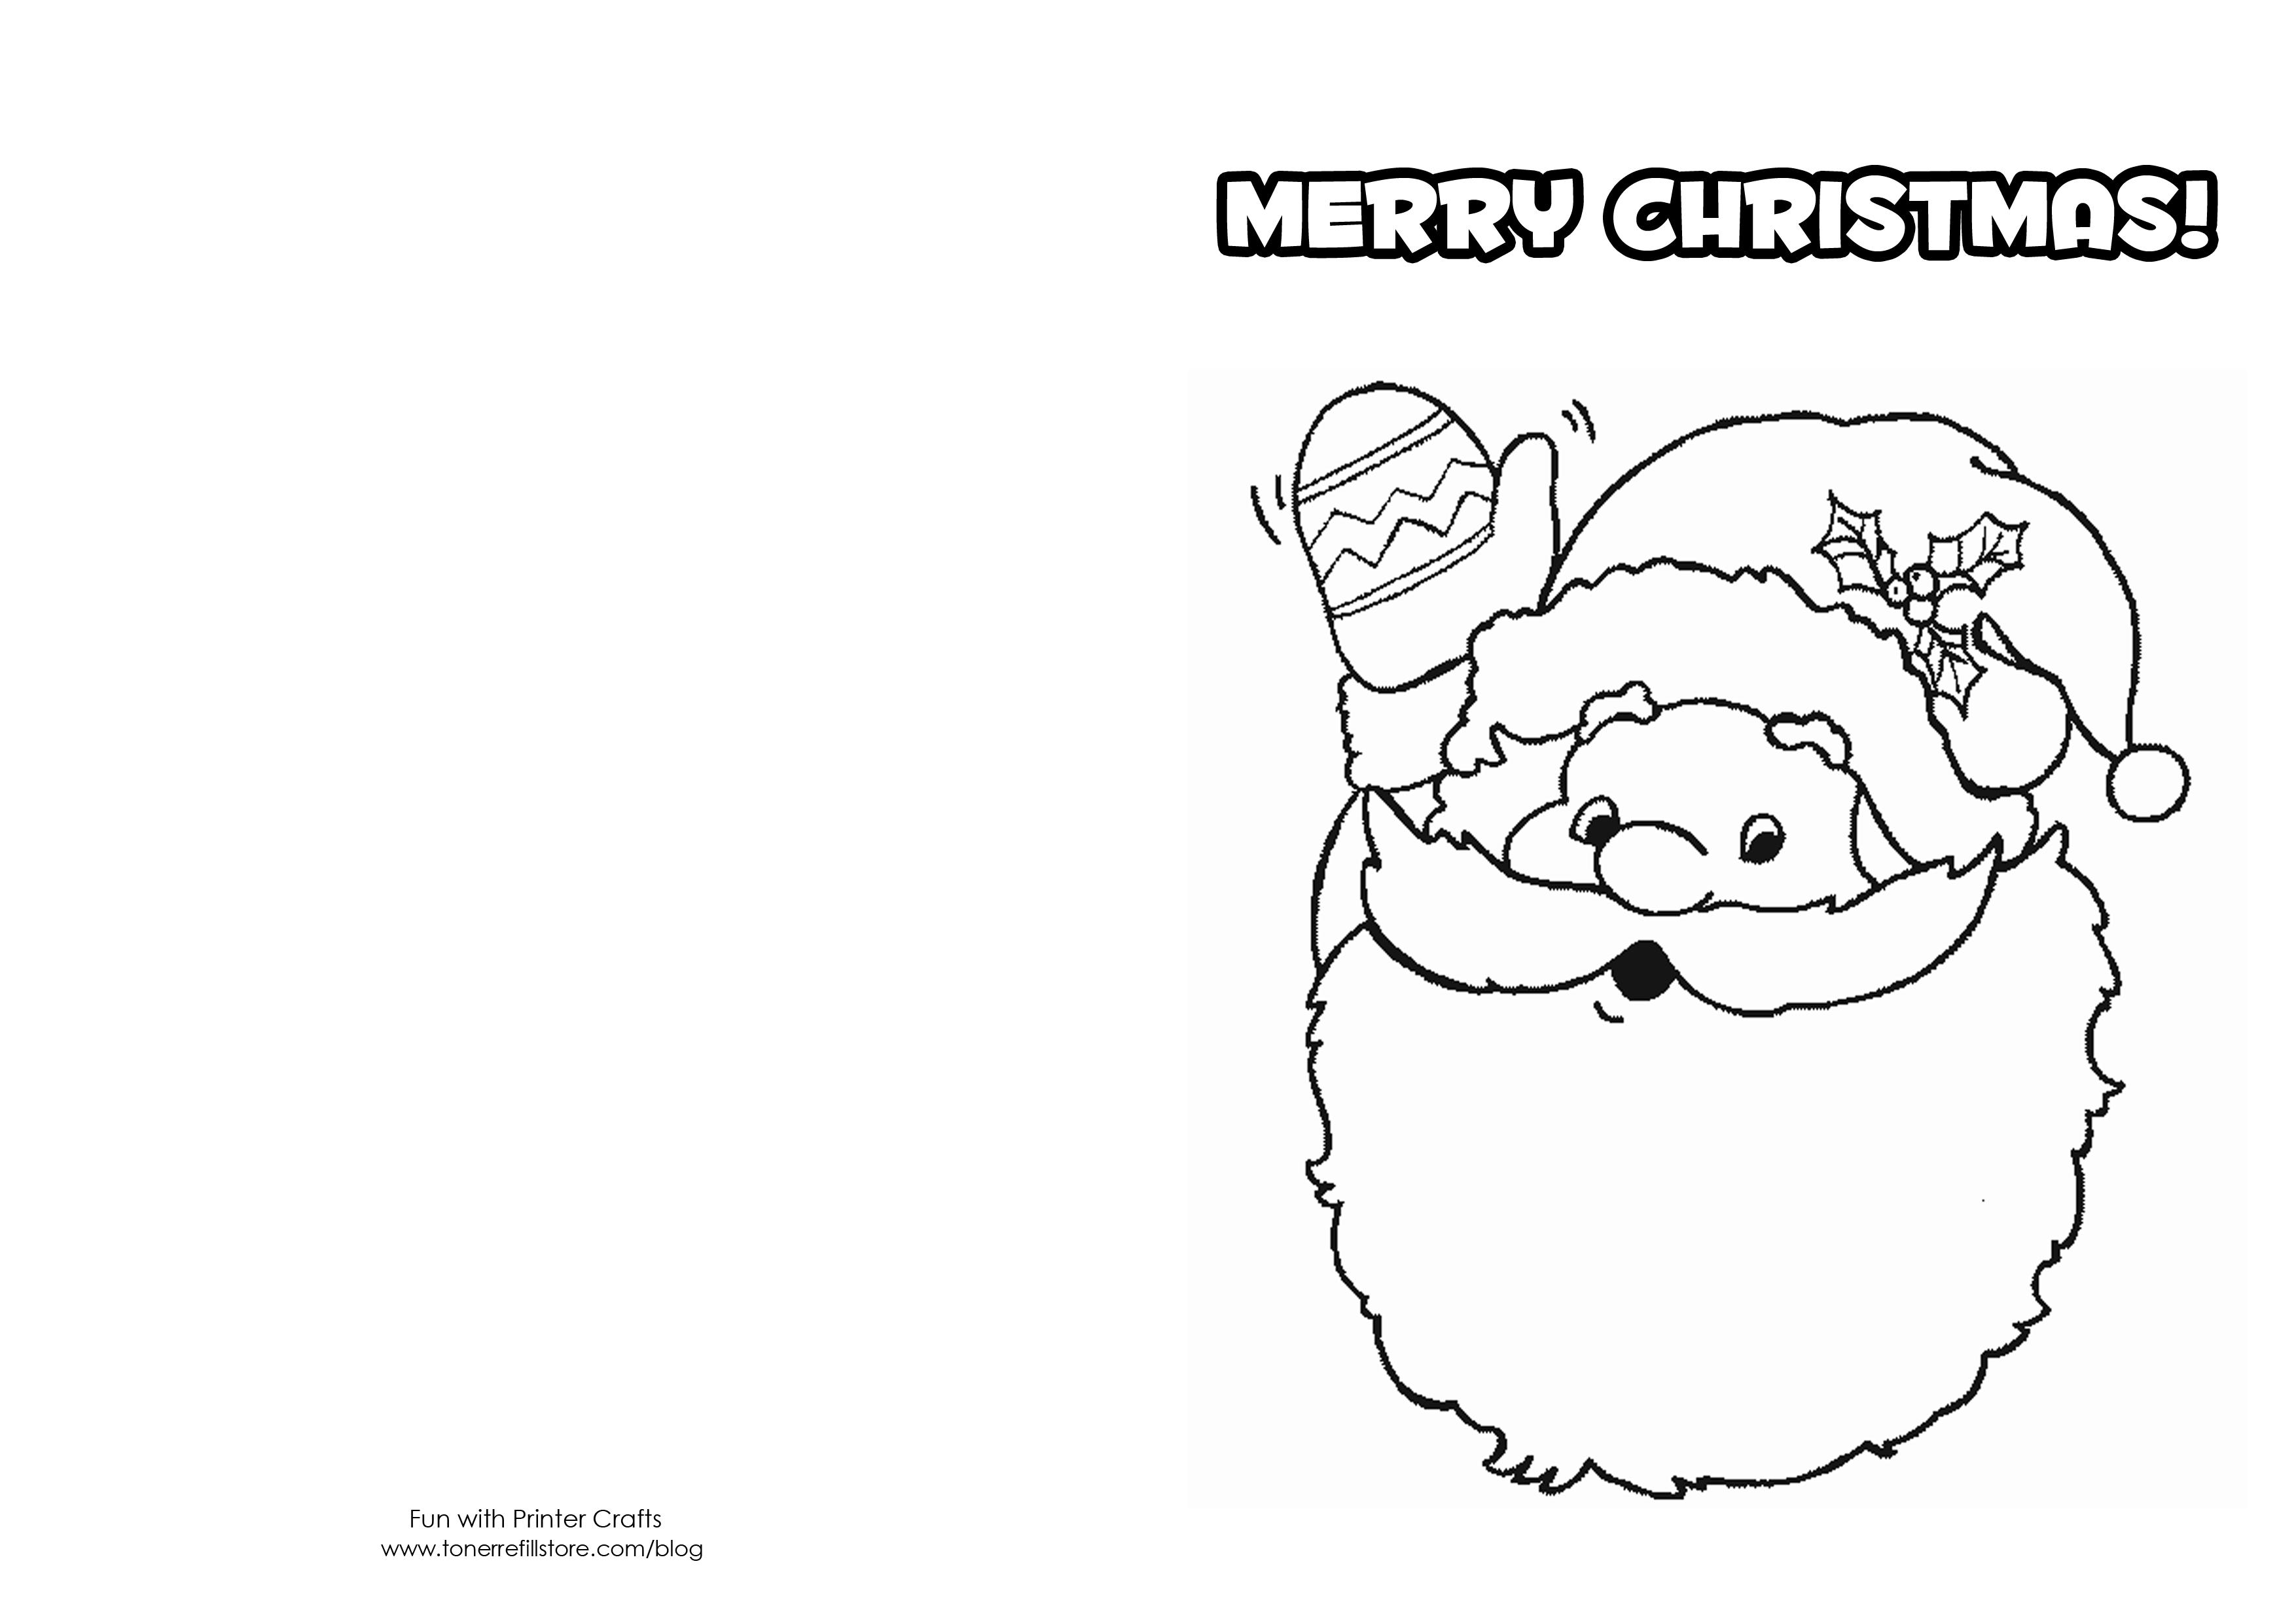 colouring templates christmas how to make printable christmas cards for kids to color templates colouring christmas